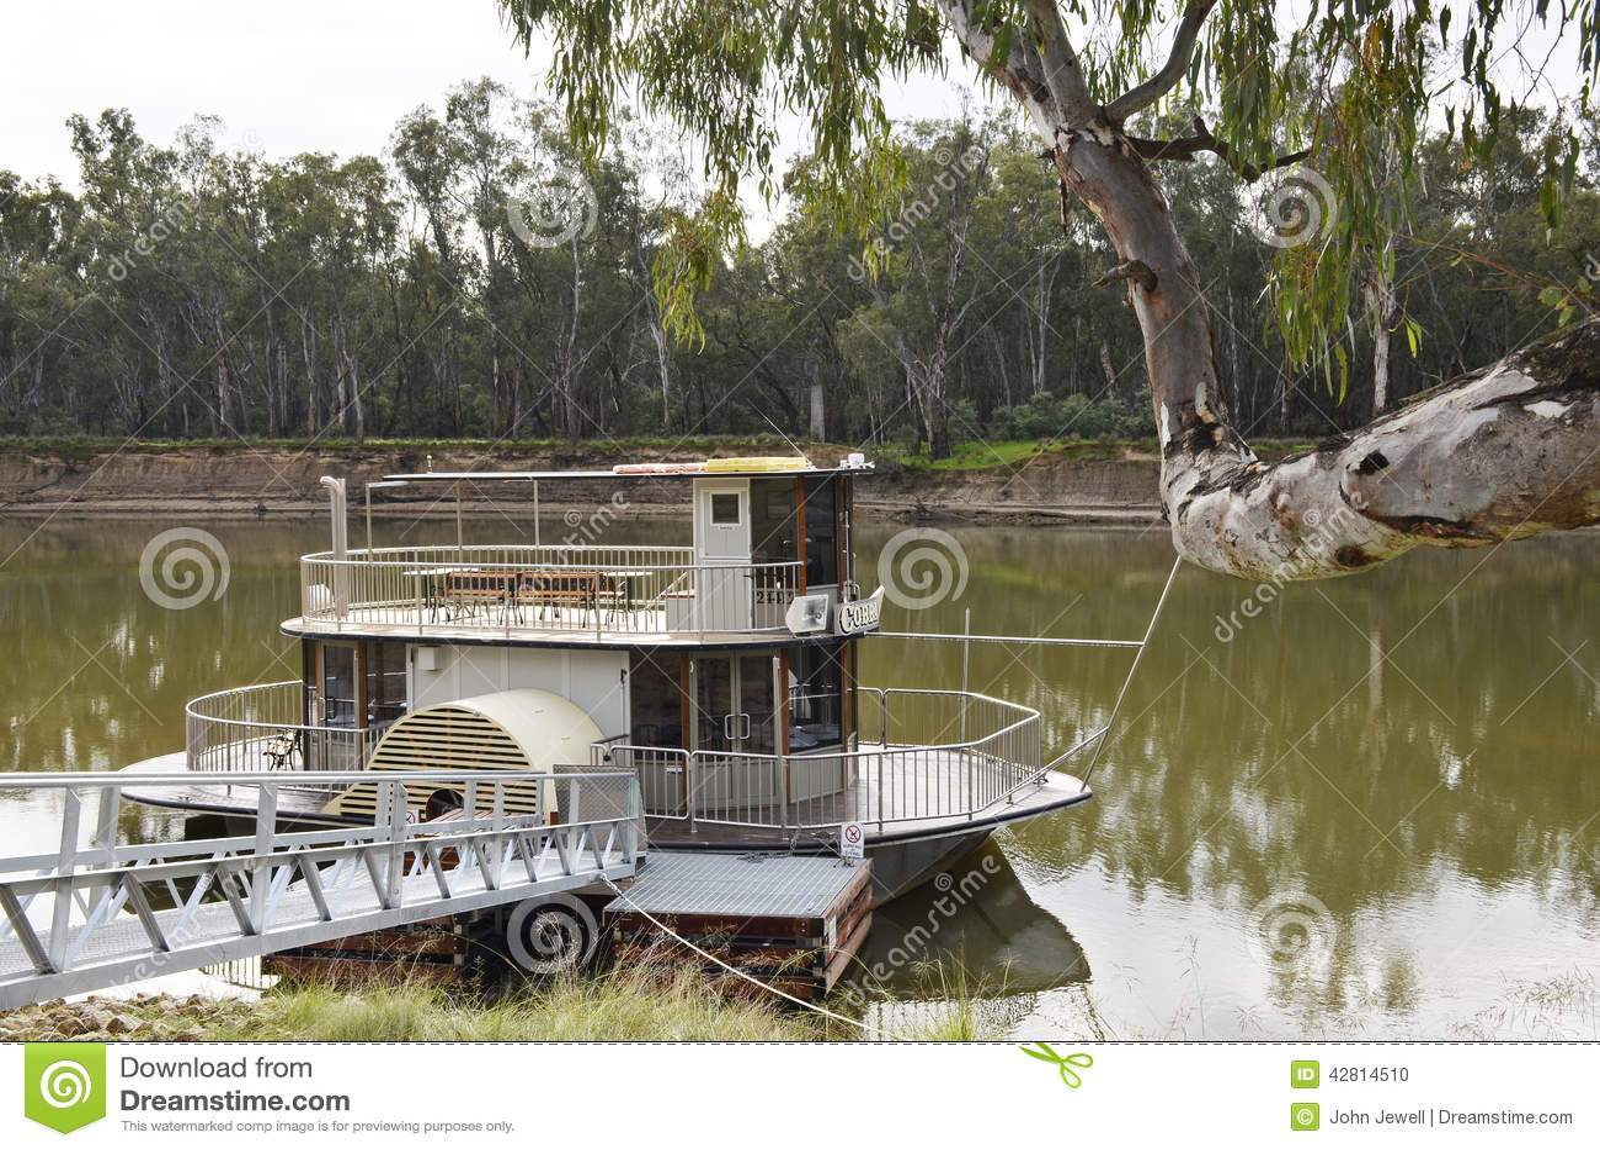 paddle-boat-tied-up-murray-river-australia-42814510 Paddlewheel Houseboat Plans on stardust houseboat, barge houseboat, sampan houseboat,